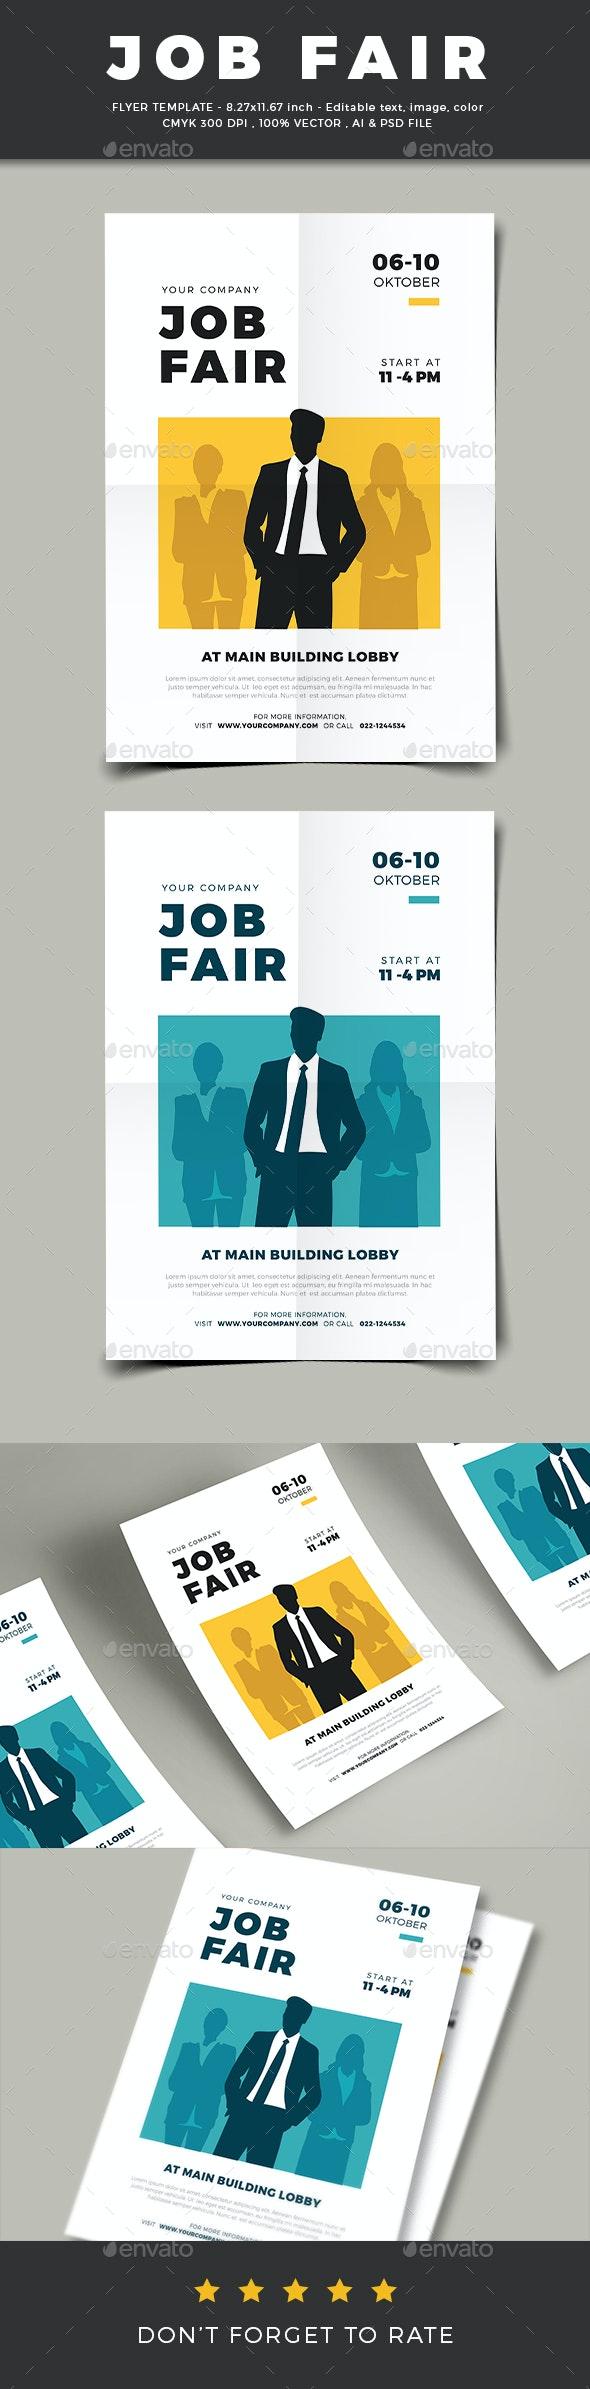 Job Fair Flyer Template - Corporate Flyers